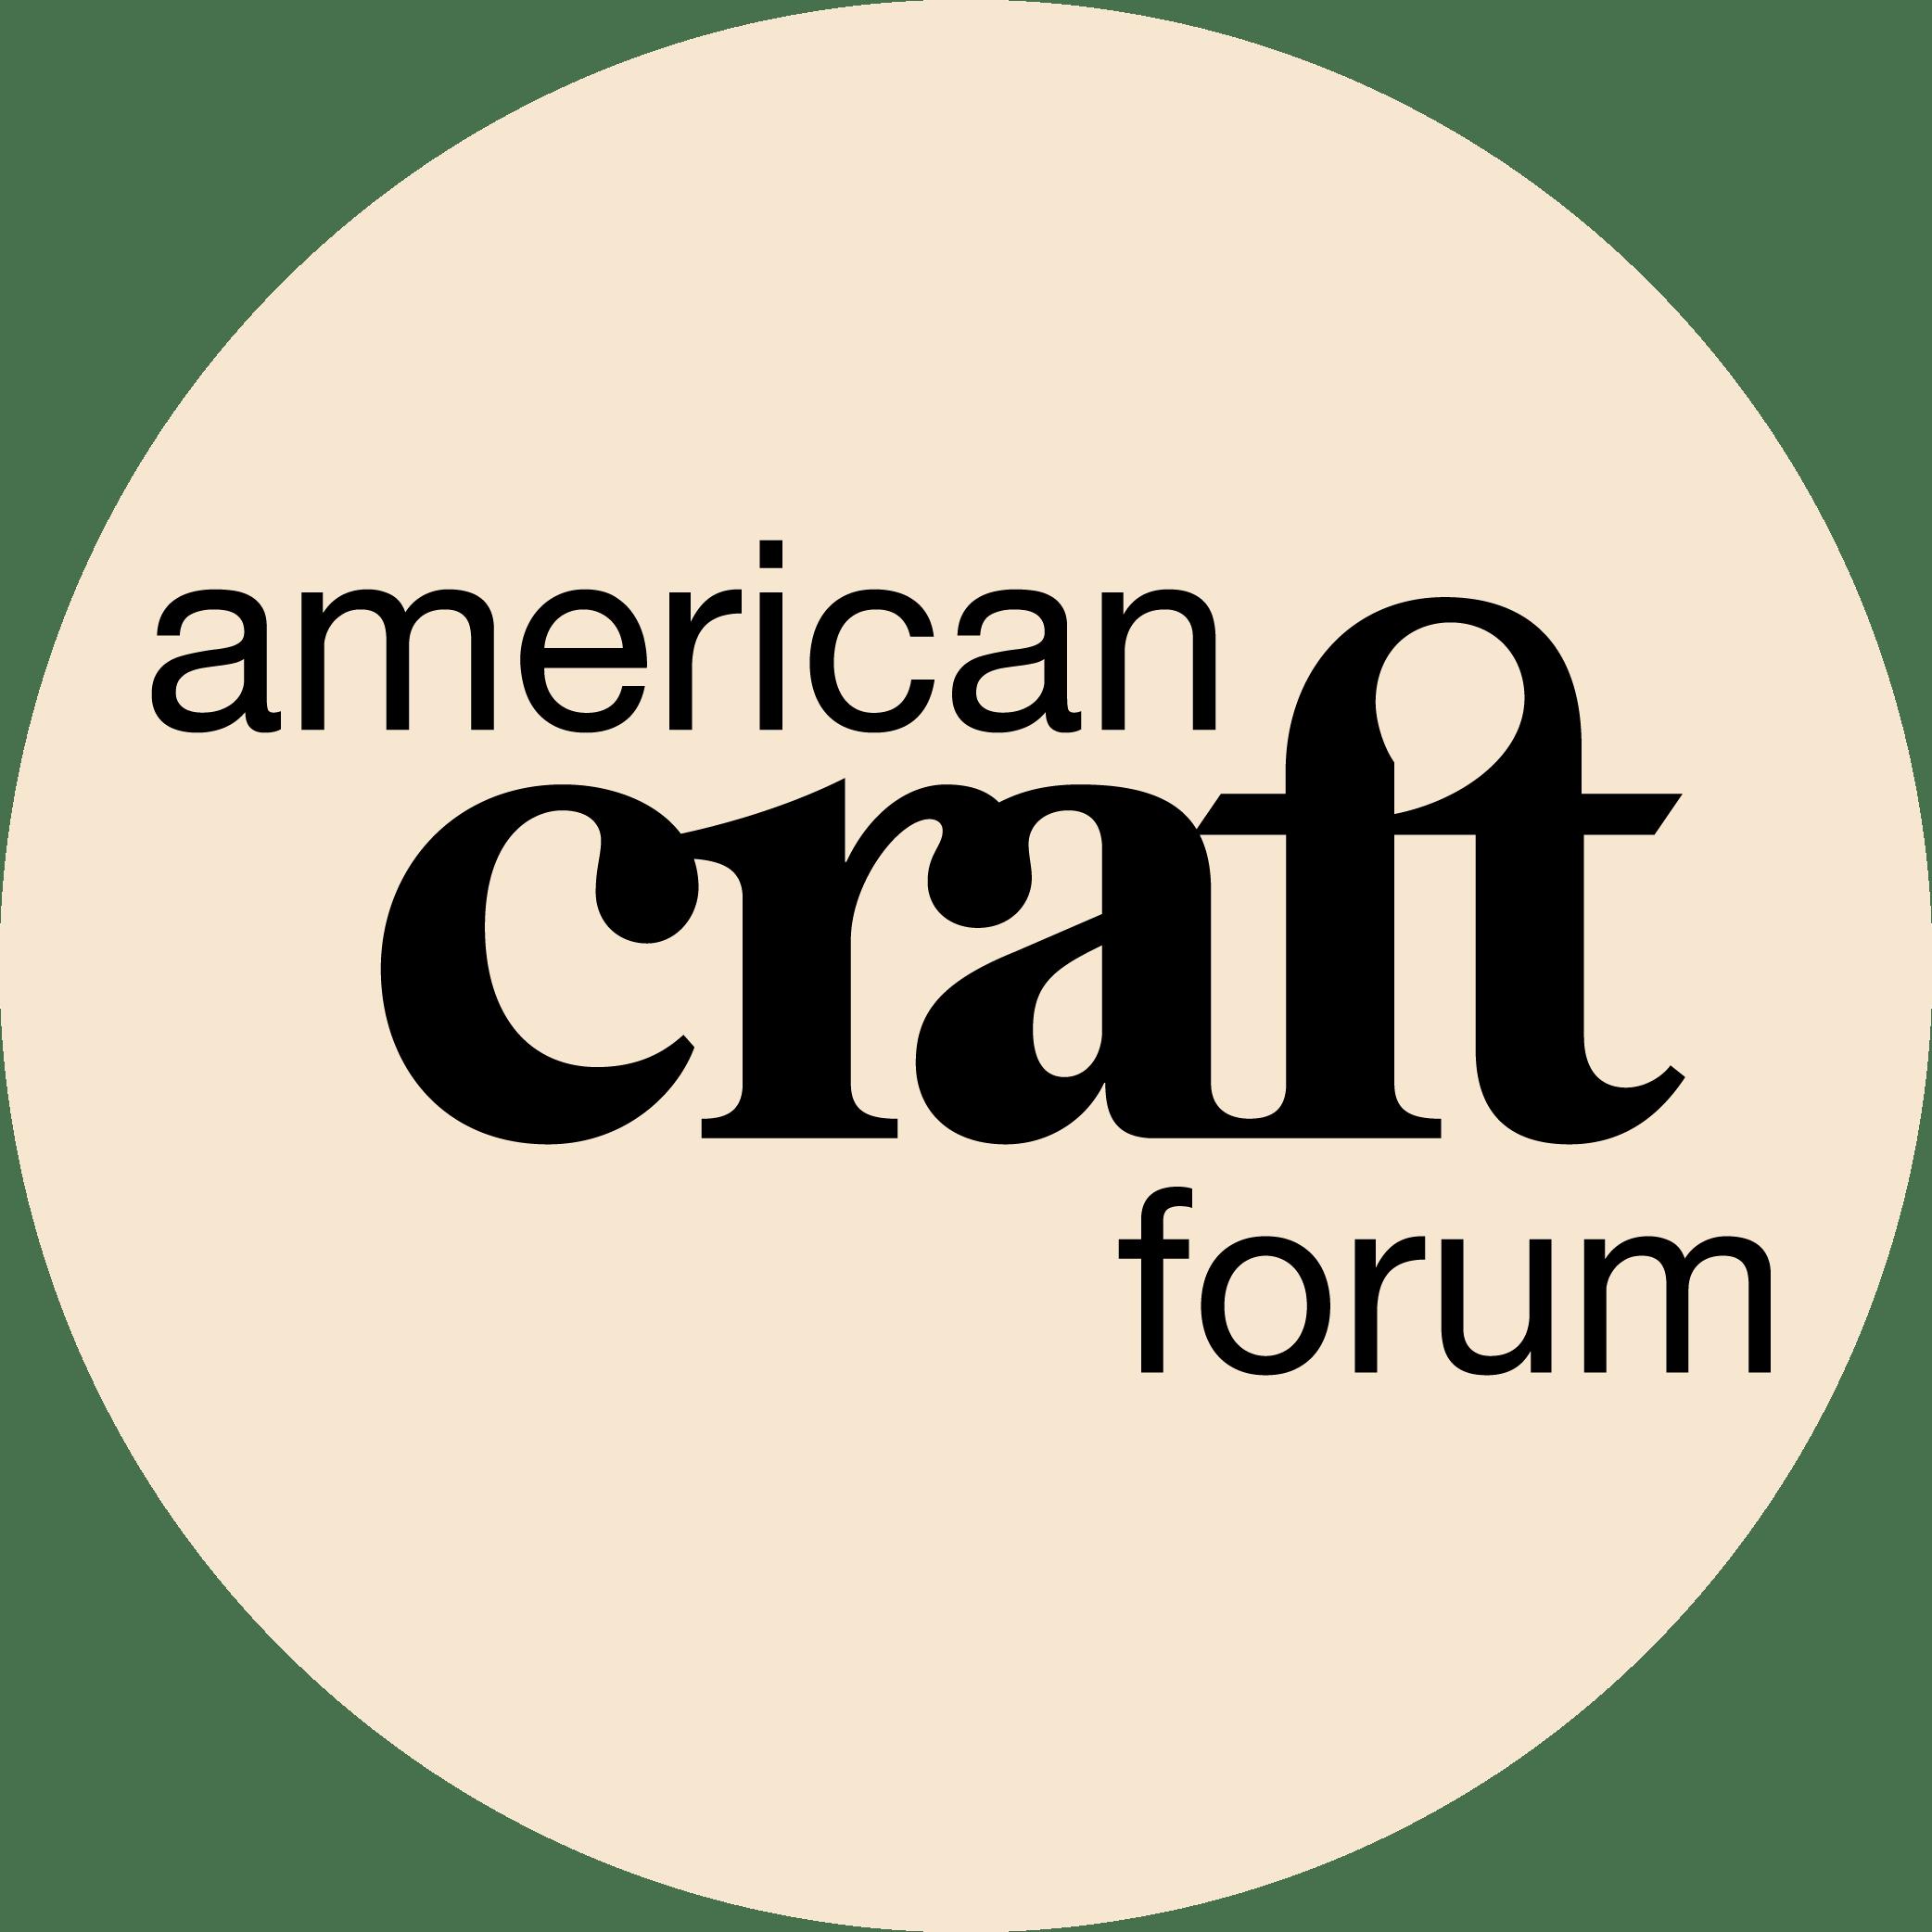 American Craft Forum logo